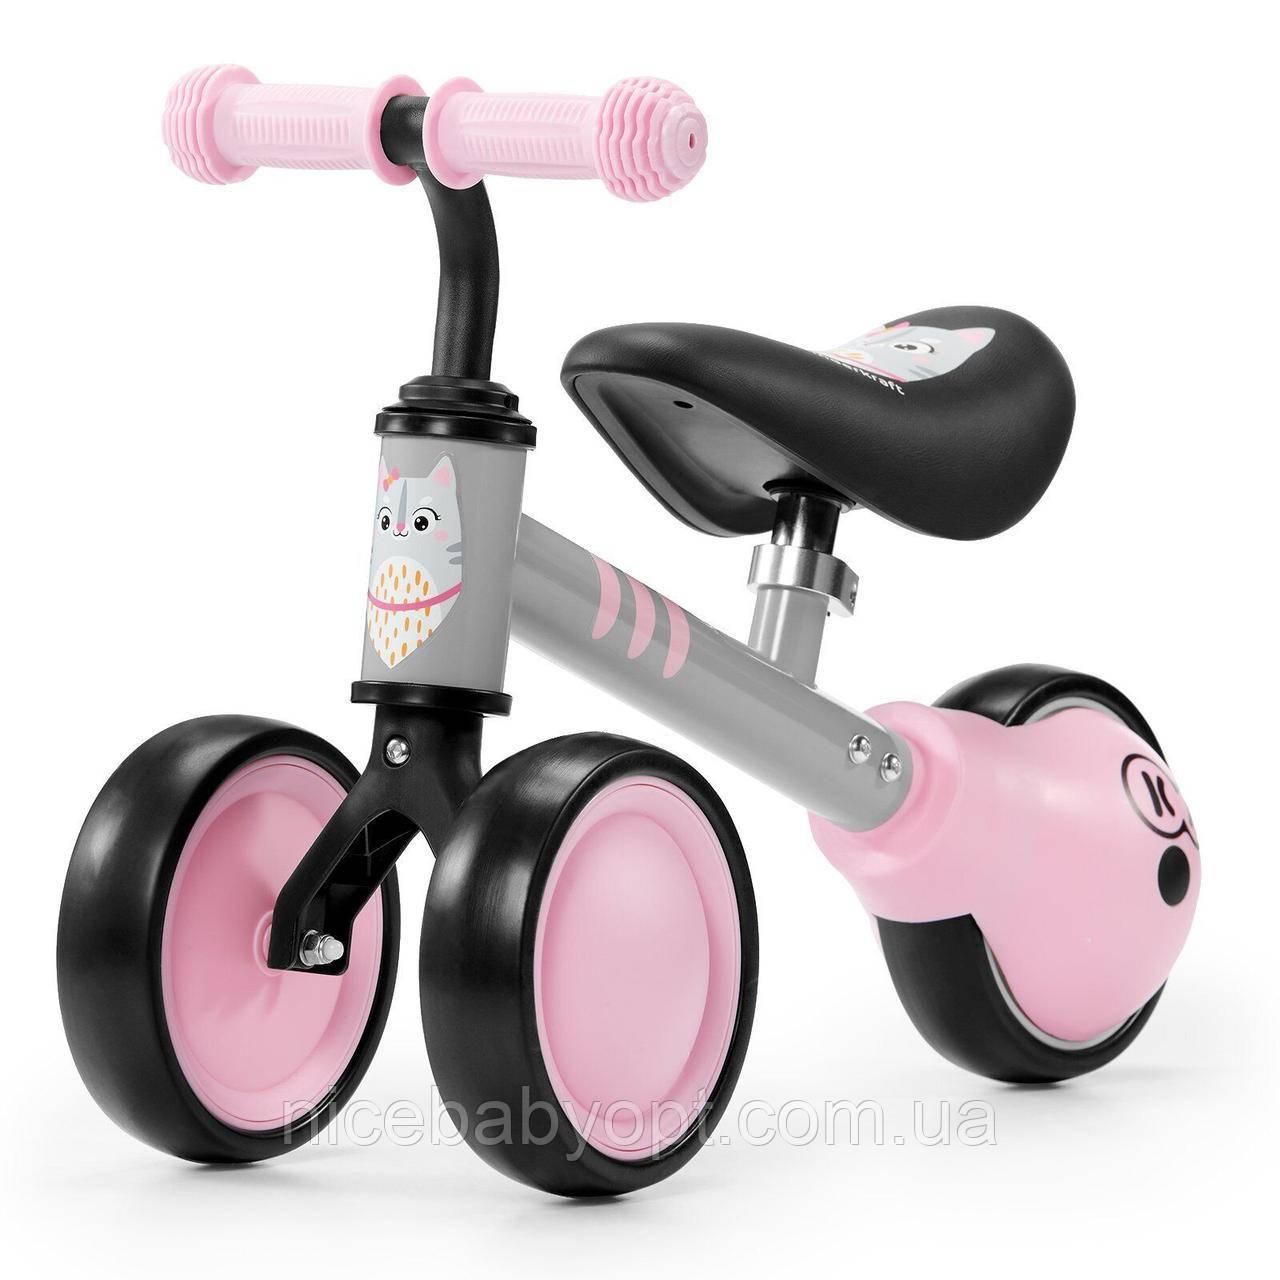 Каталка-беговел Kinderkraft Cutie Pink